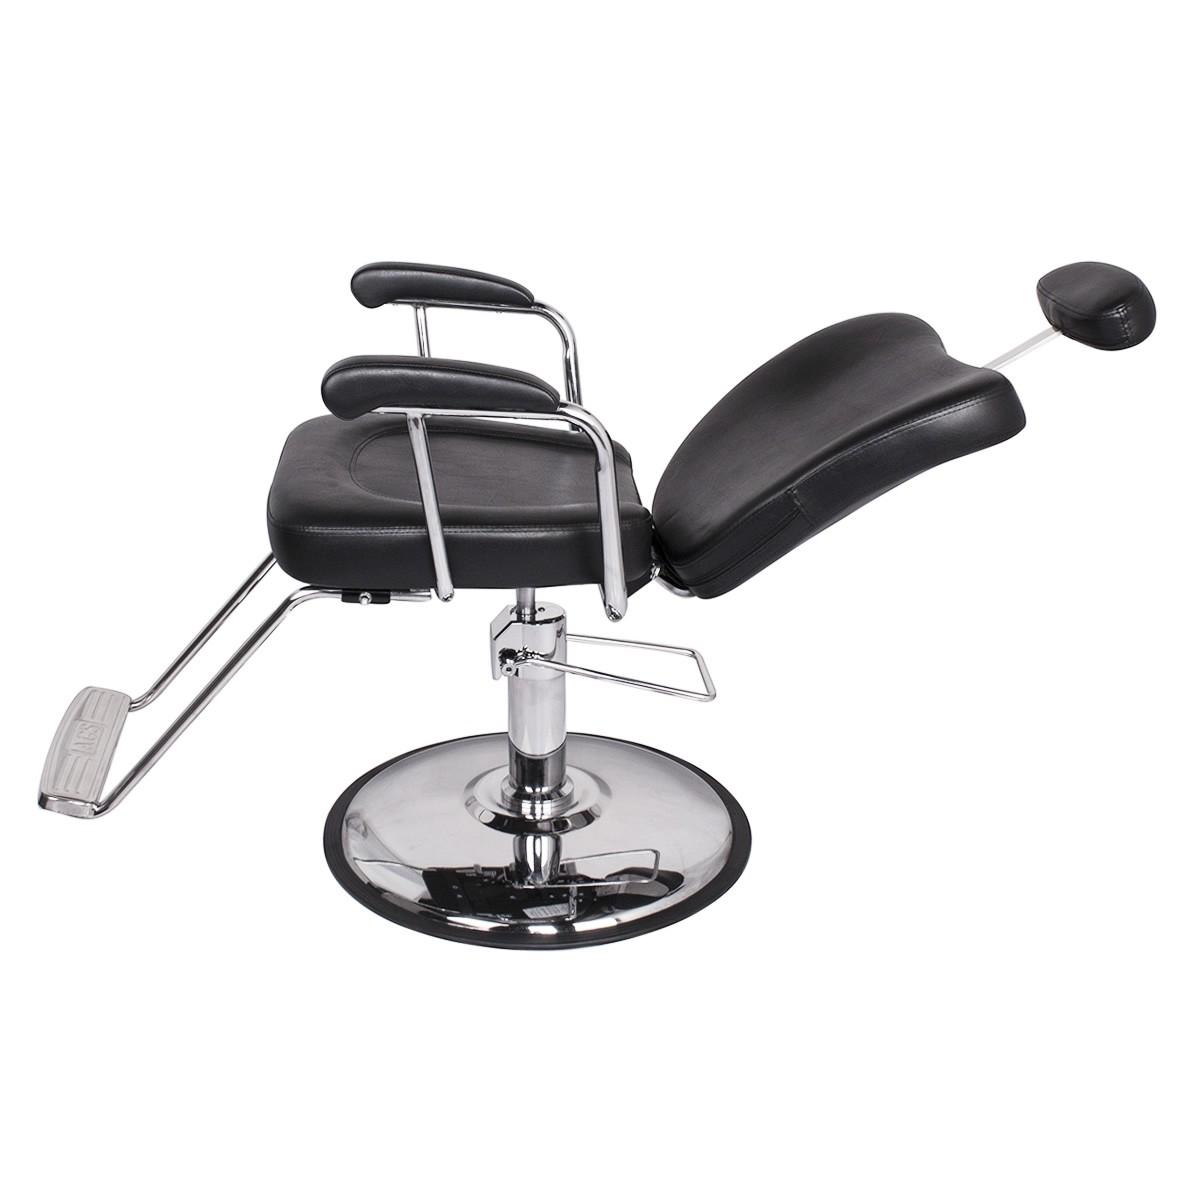 """DALLAS"" Reclining All-Purpose Salon Chair, All Purpose Styling Chair, Reclining Salon Chair"